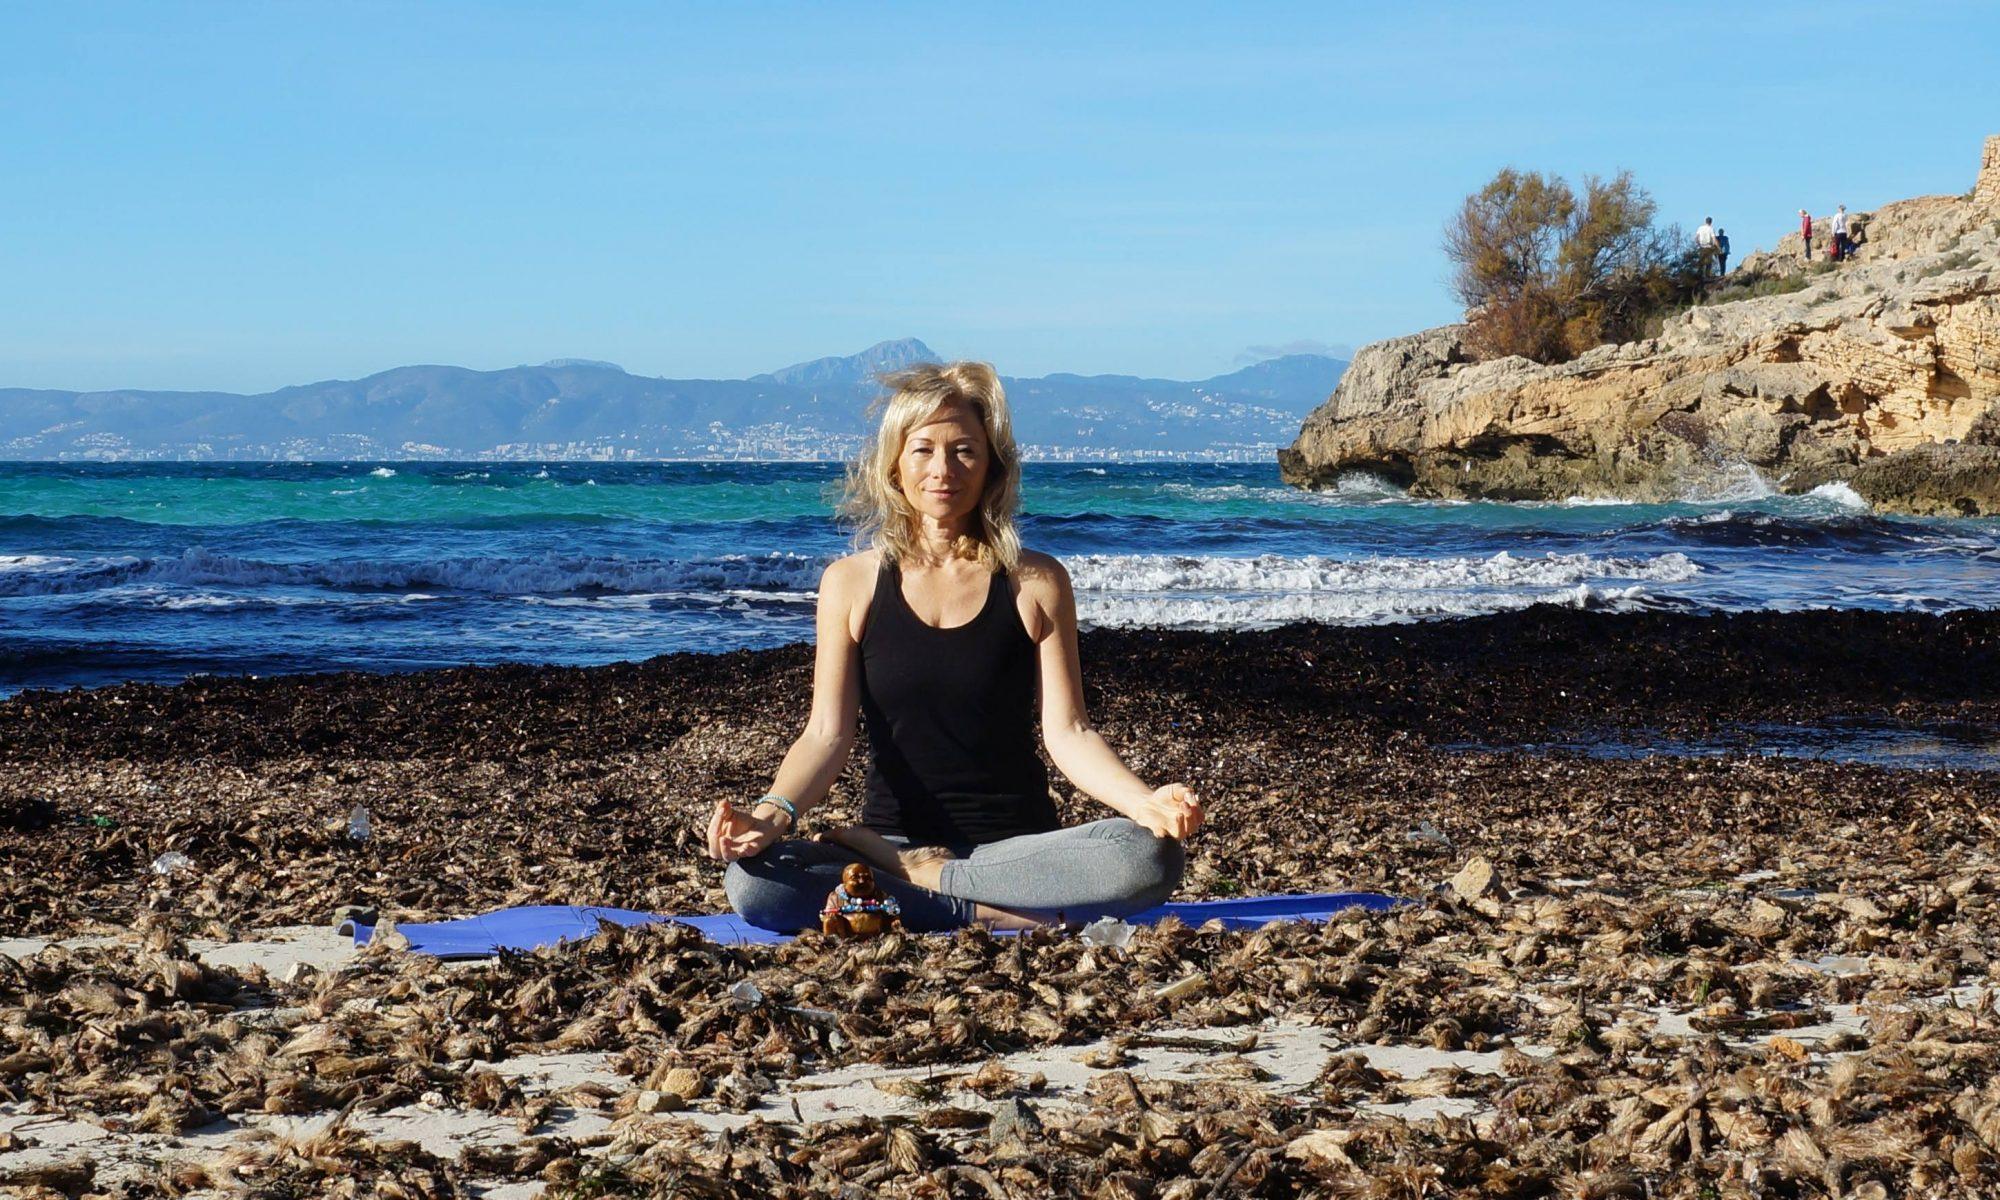 Yoga La Vida: Yoga auf Mallorca